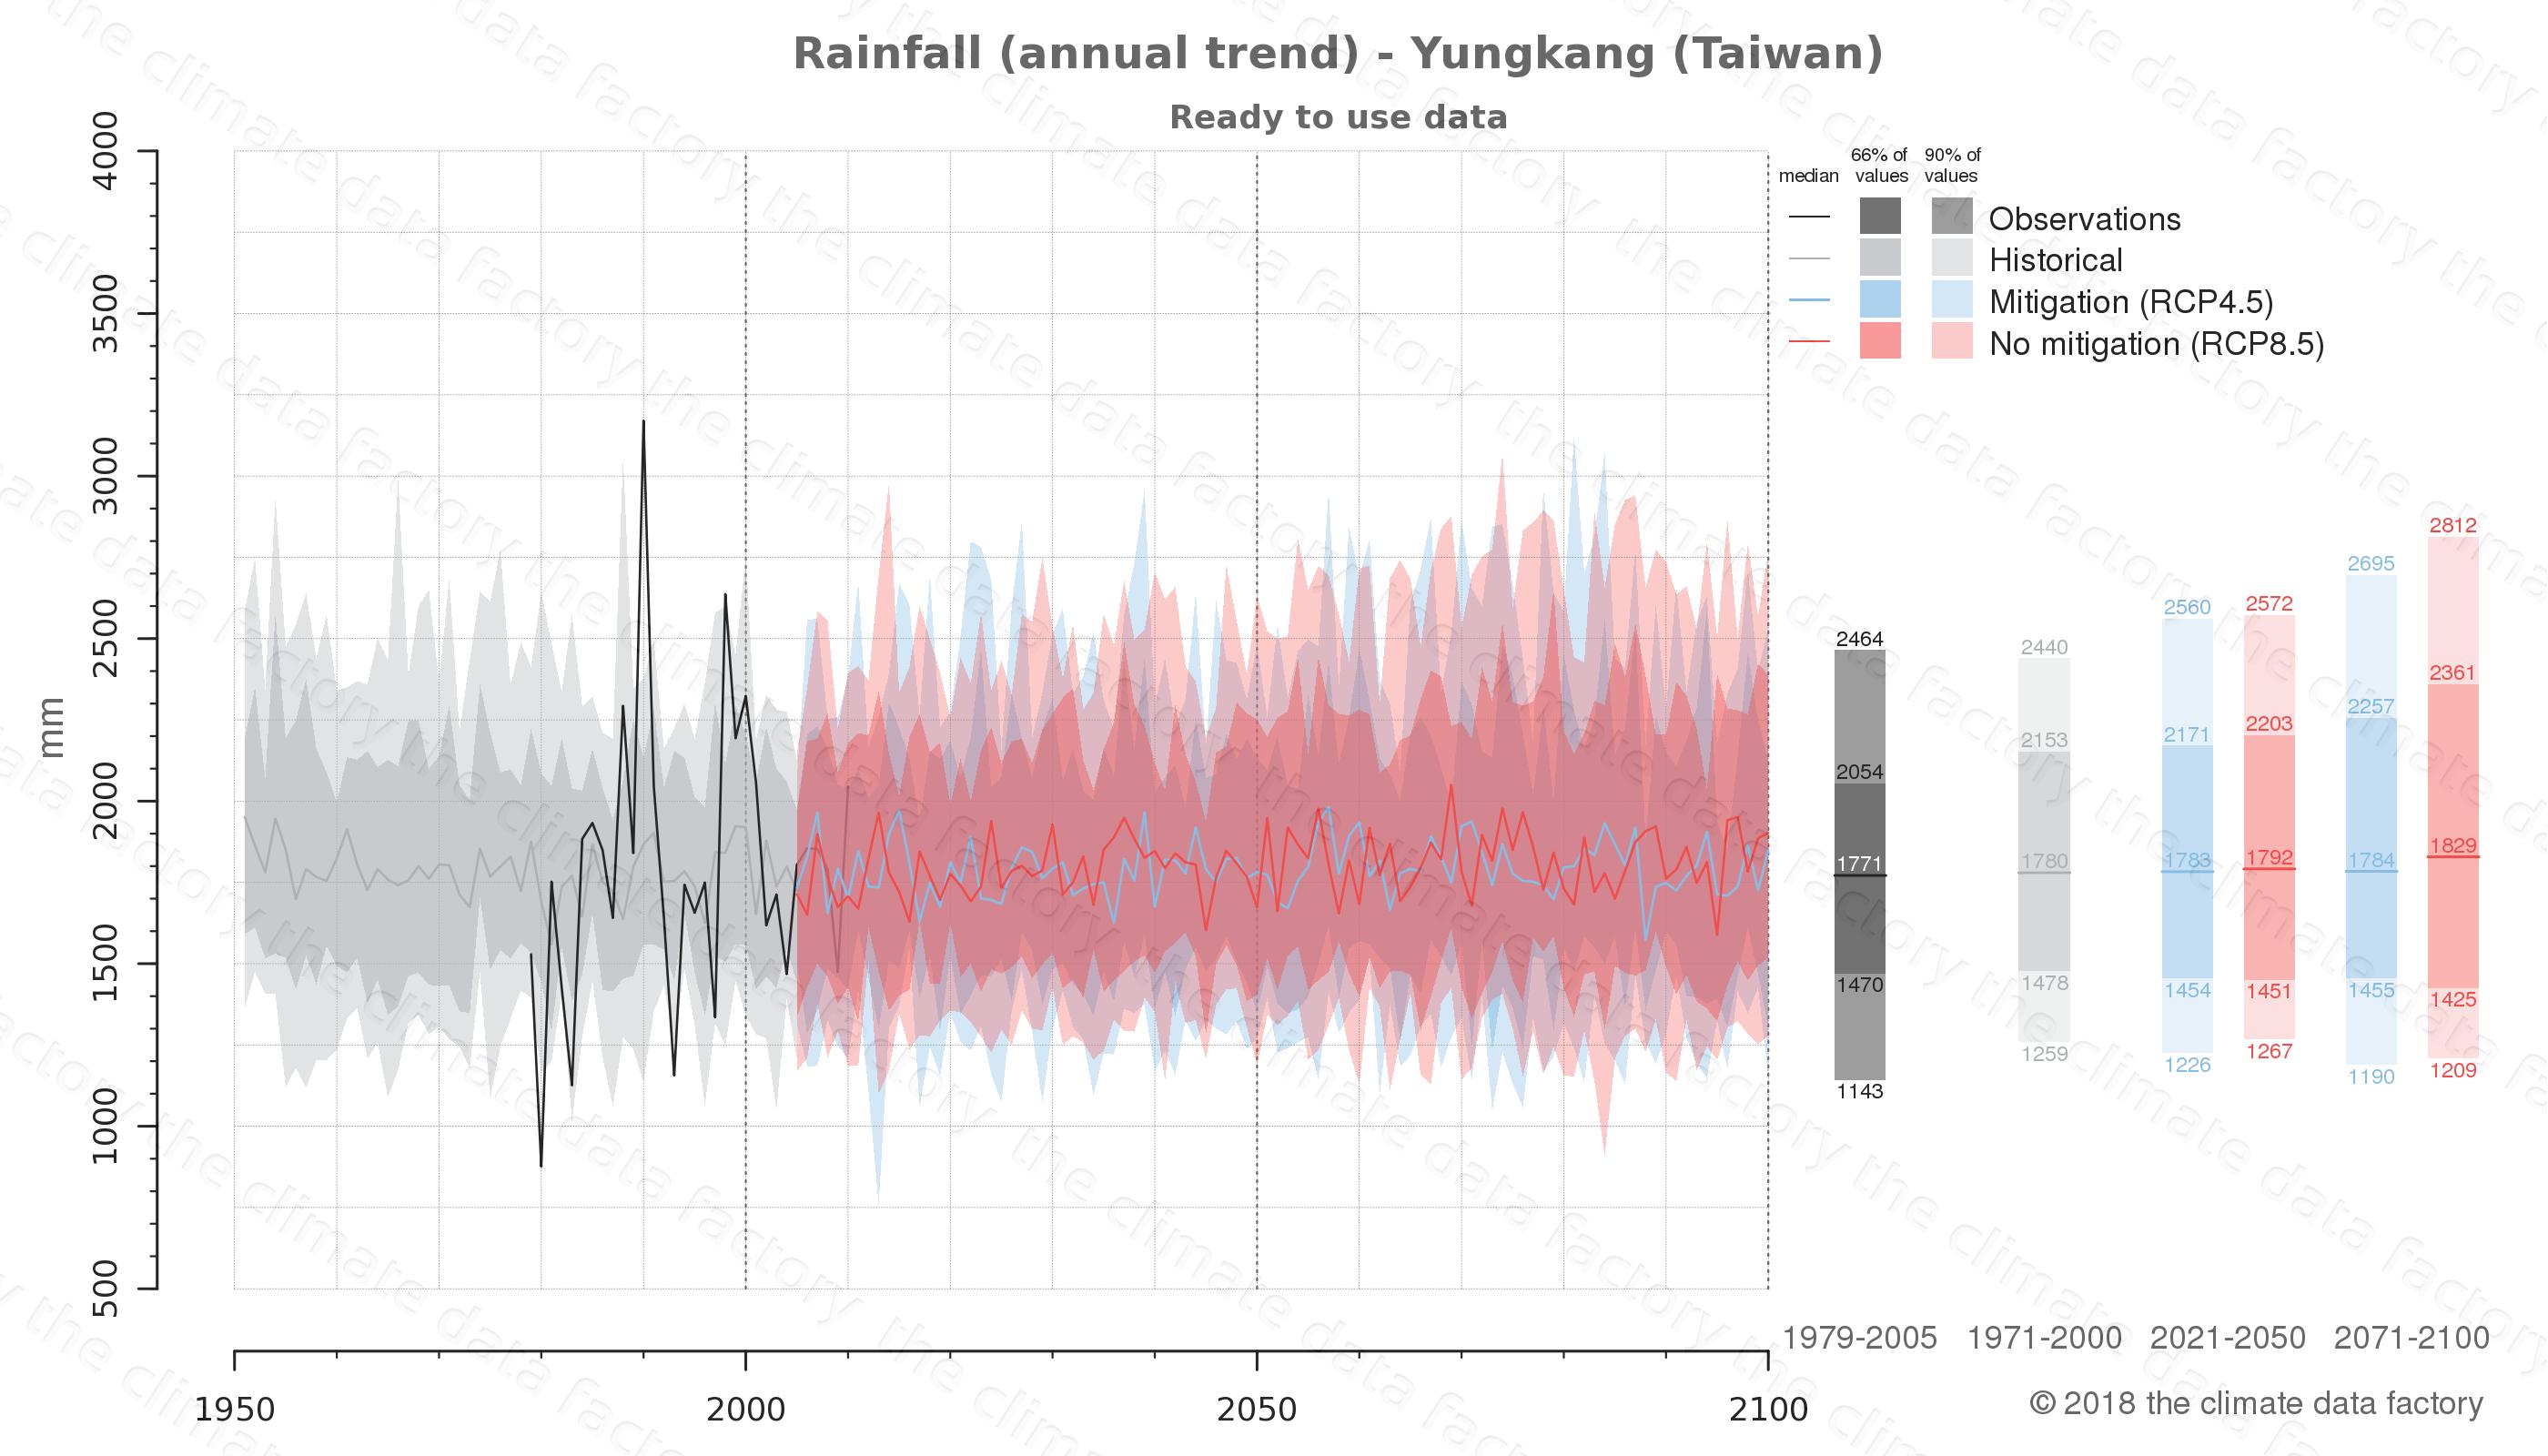 climate change data policy adaptation climate graph city data rainfall yungkang taiwan